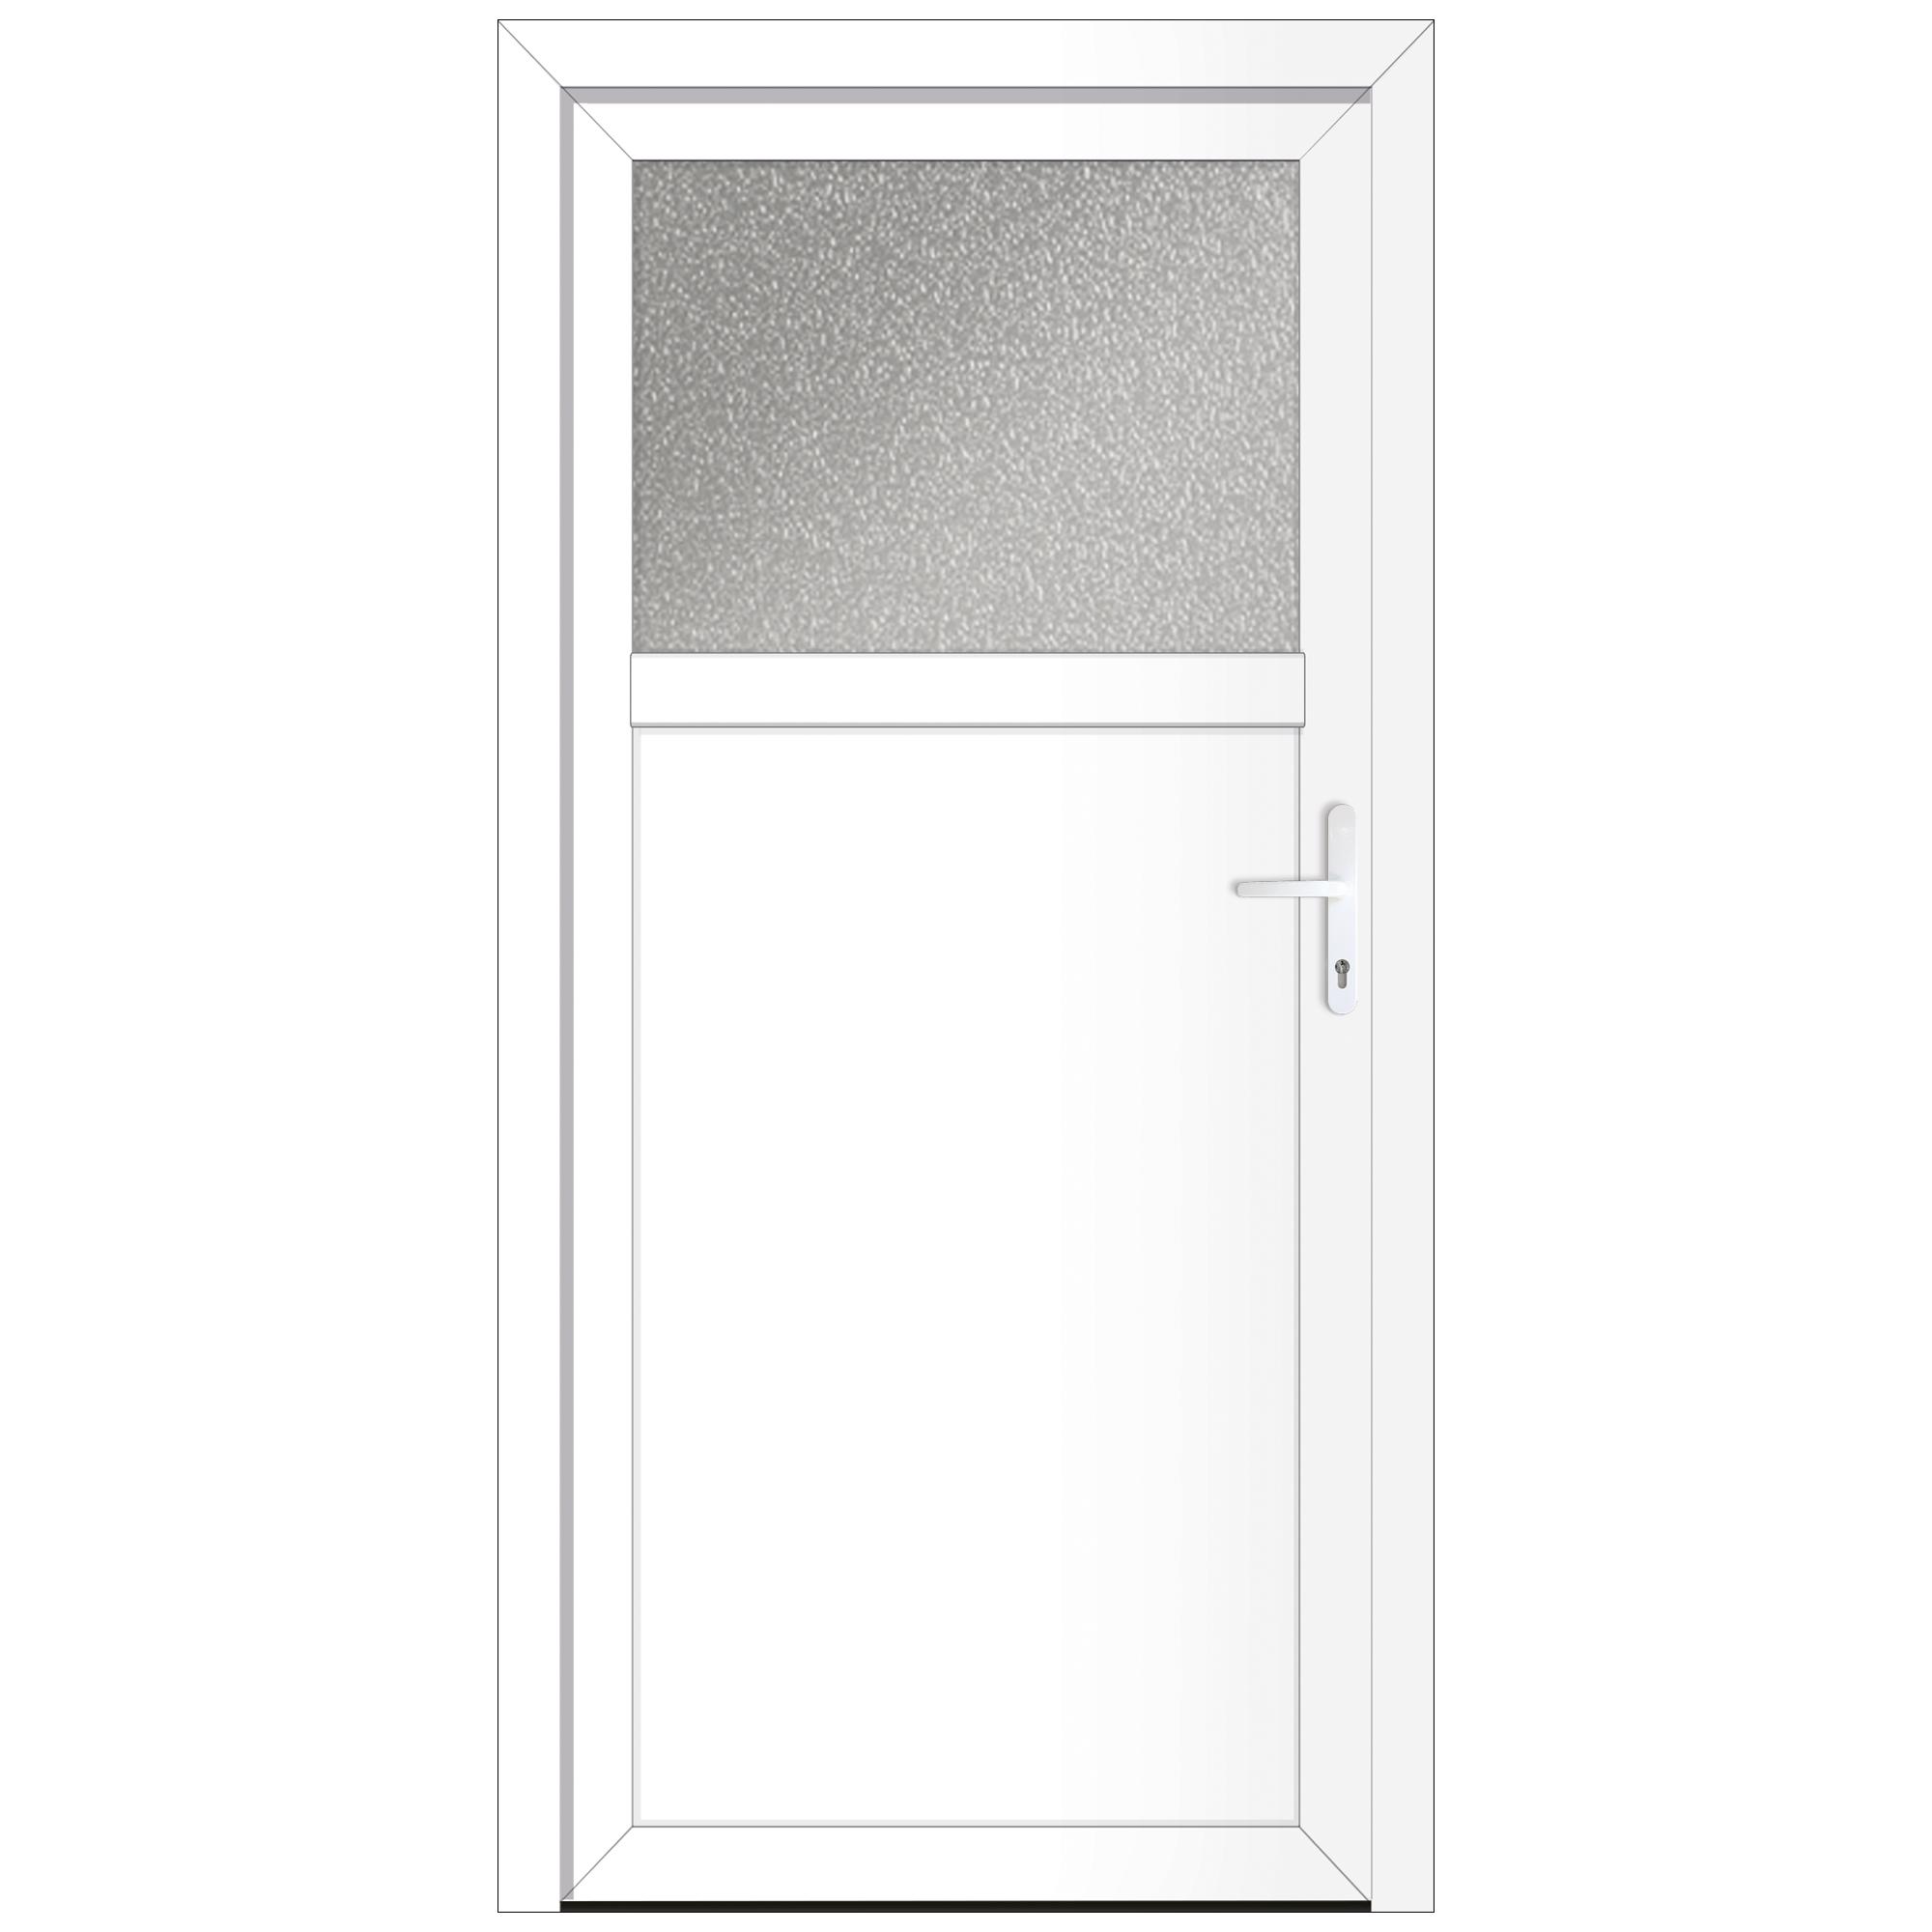 Dreh Kipp wei/ß LAGERWARE Fenster DIN rechts BxH: 100 x 200 cm // 1000 x 2000 mm T/ür Kunststoff Balkont/ür